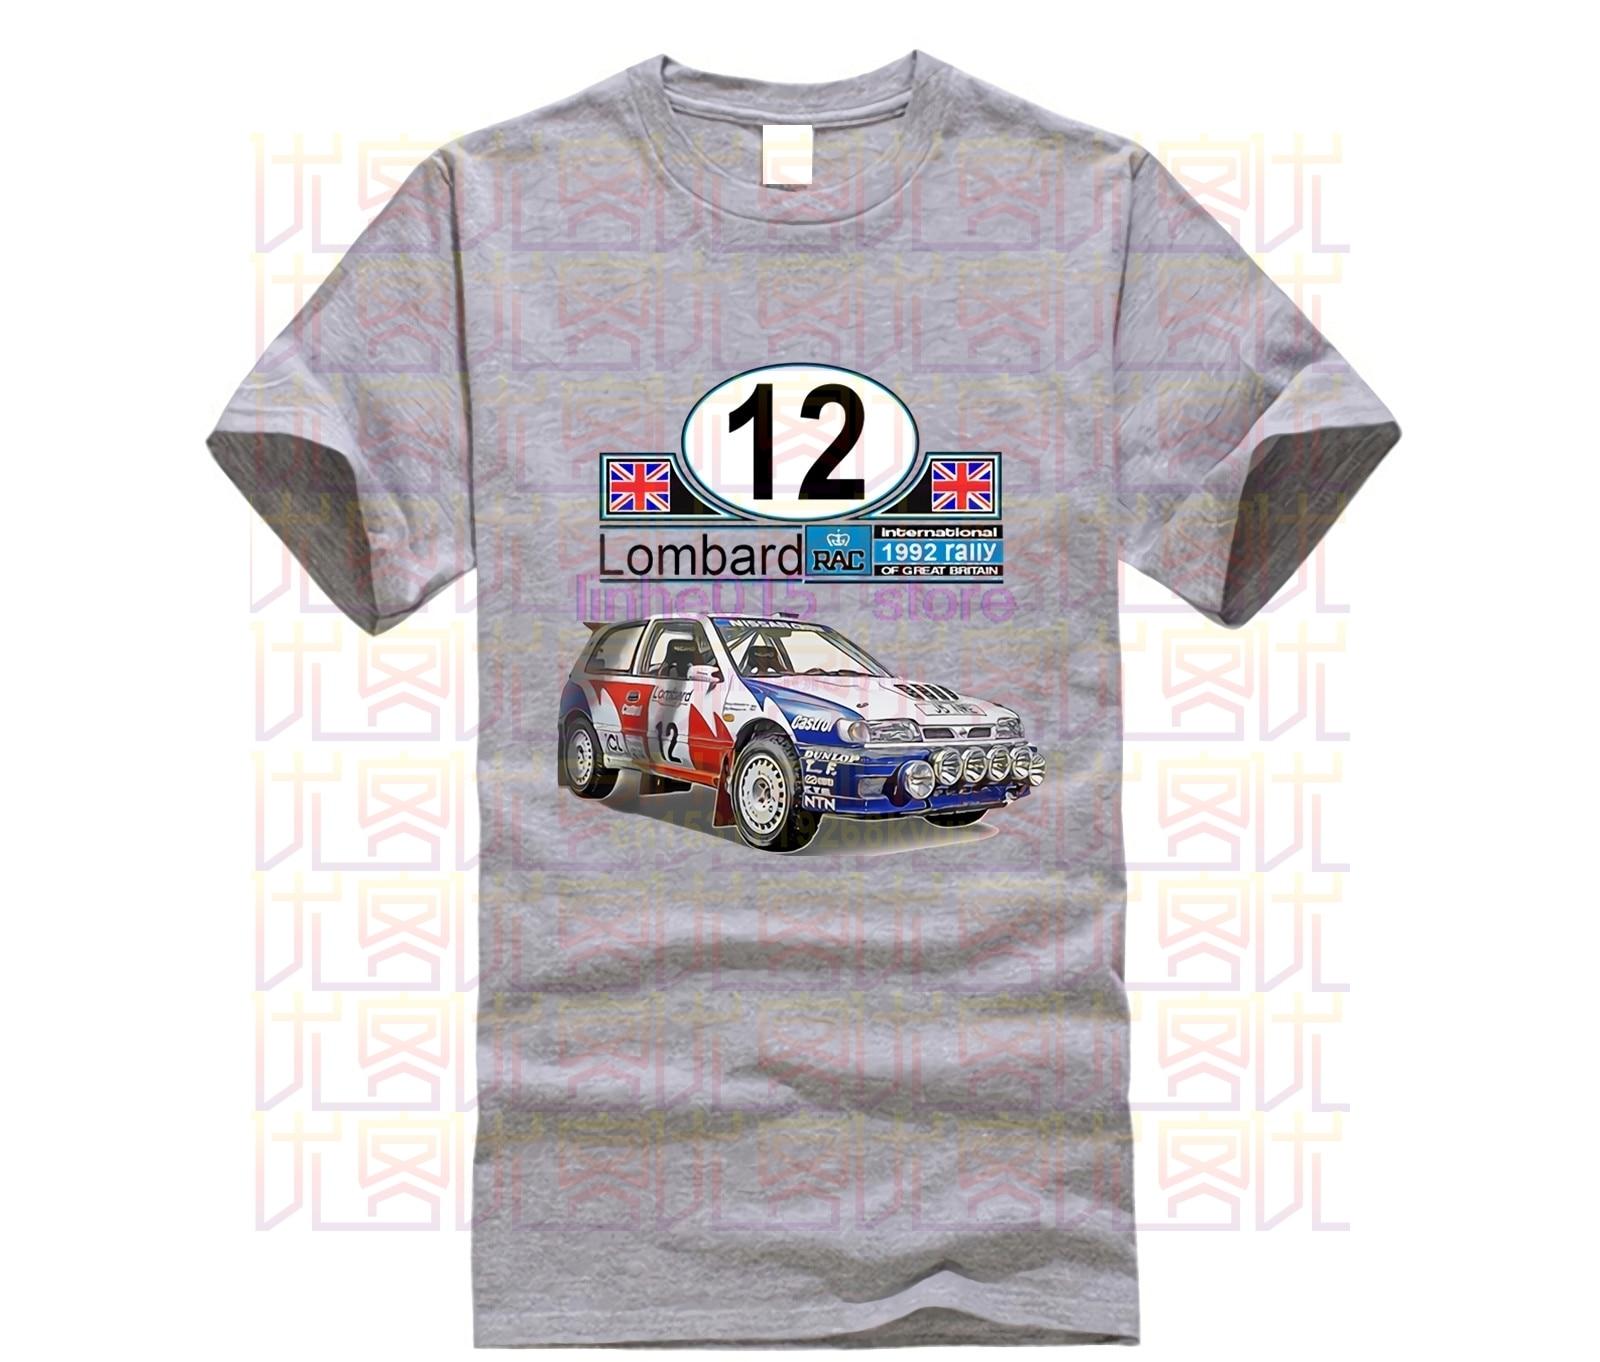 2019 moda 1992 japonés fans del coche Sunny GTI-R grupo A Lombard RAC Rally suave algodón camiseta Jdm camiseta